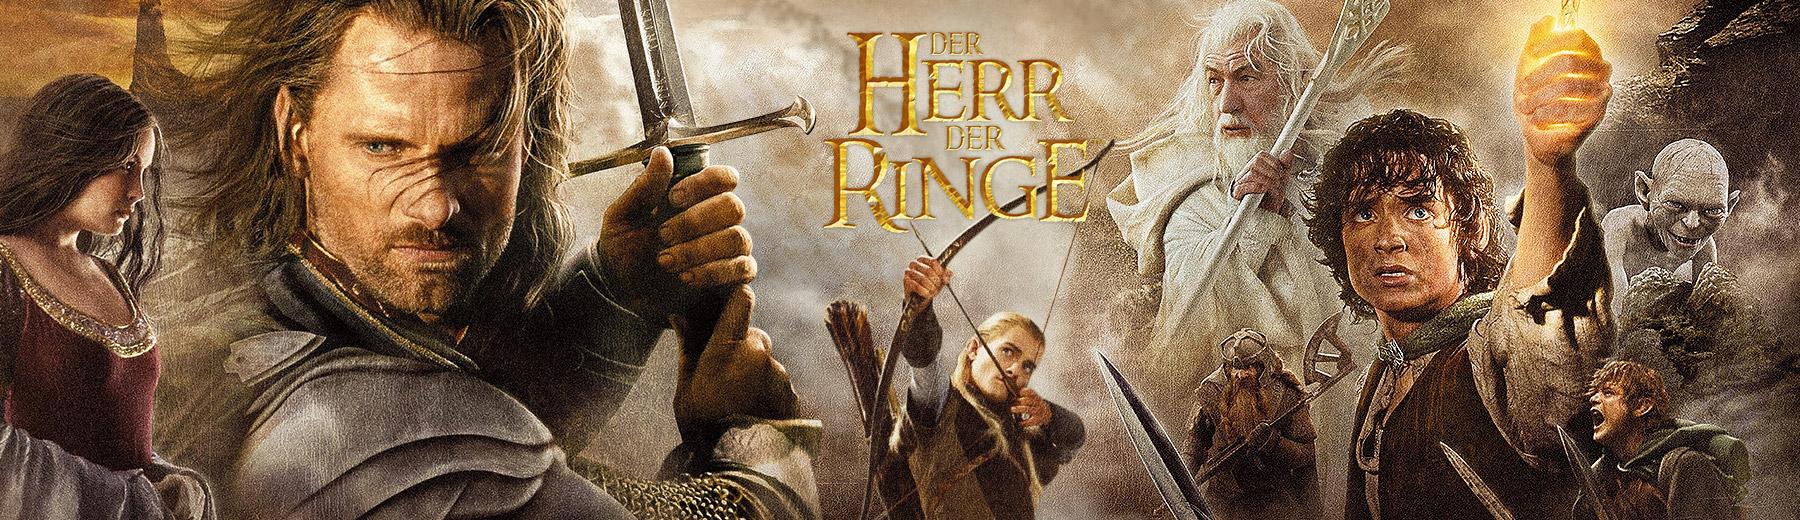 Regie Herr Der Ringe